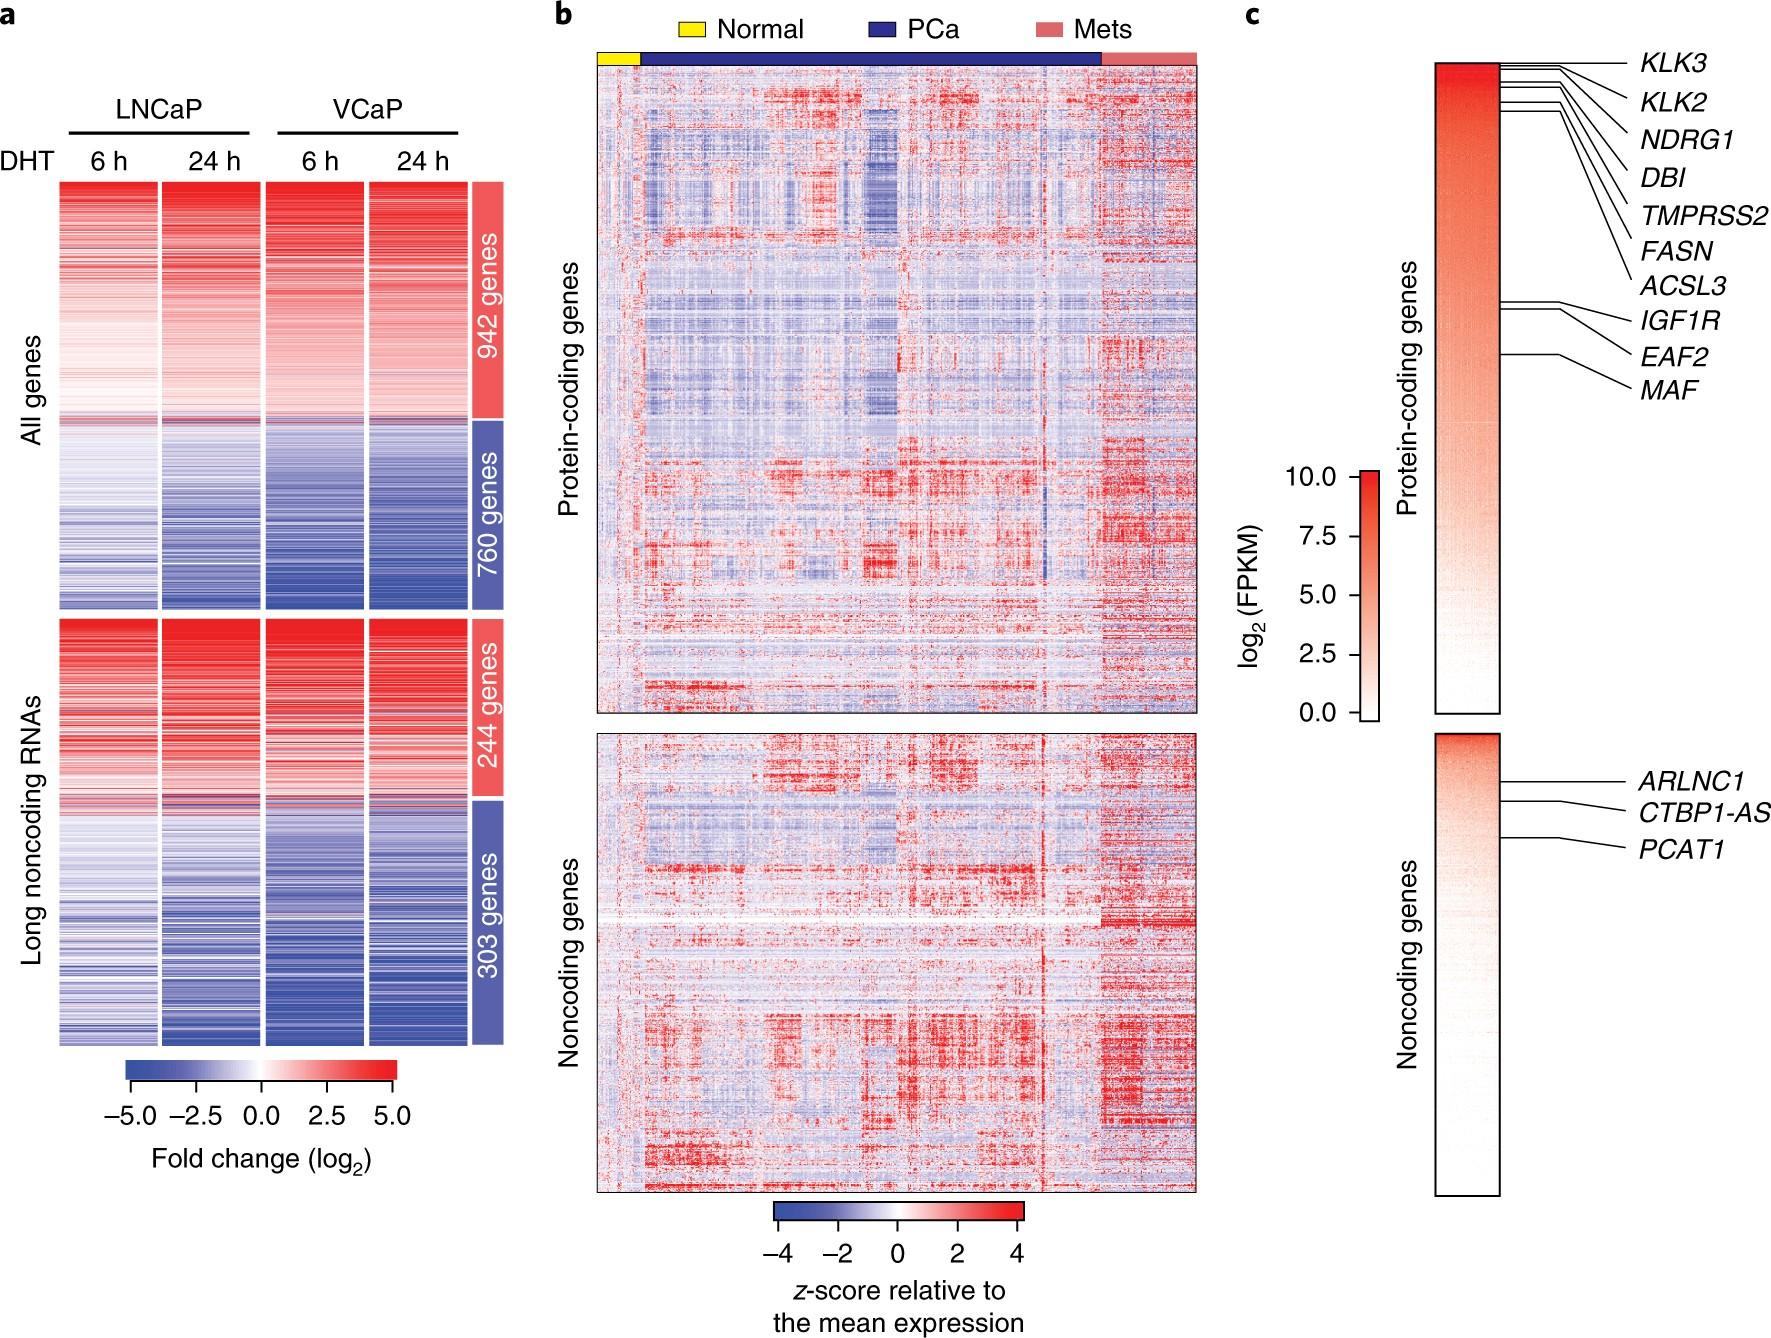 analysis of the androgen receptor\u2013regulated lncrna landscapeanalysis of the androgen receptor\u2013regulated lncrna landscape identifies a role for arlnc1 in prostate cancer progression nature genetics